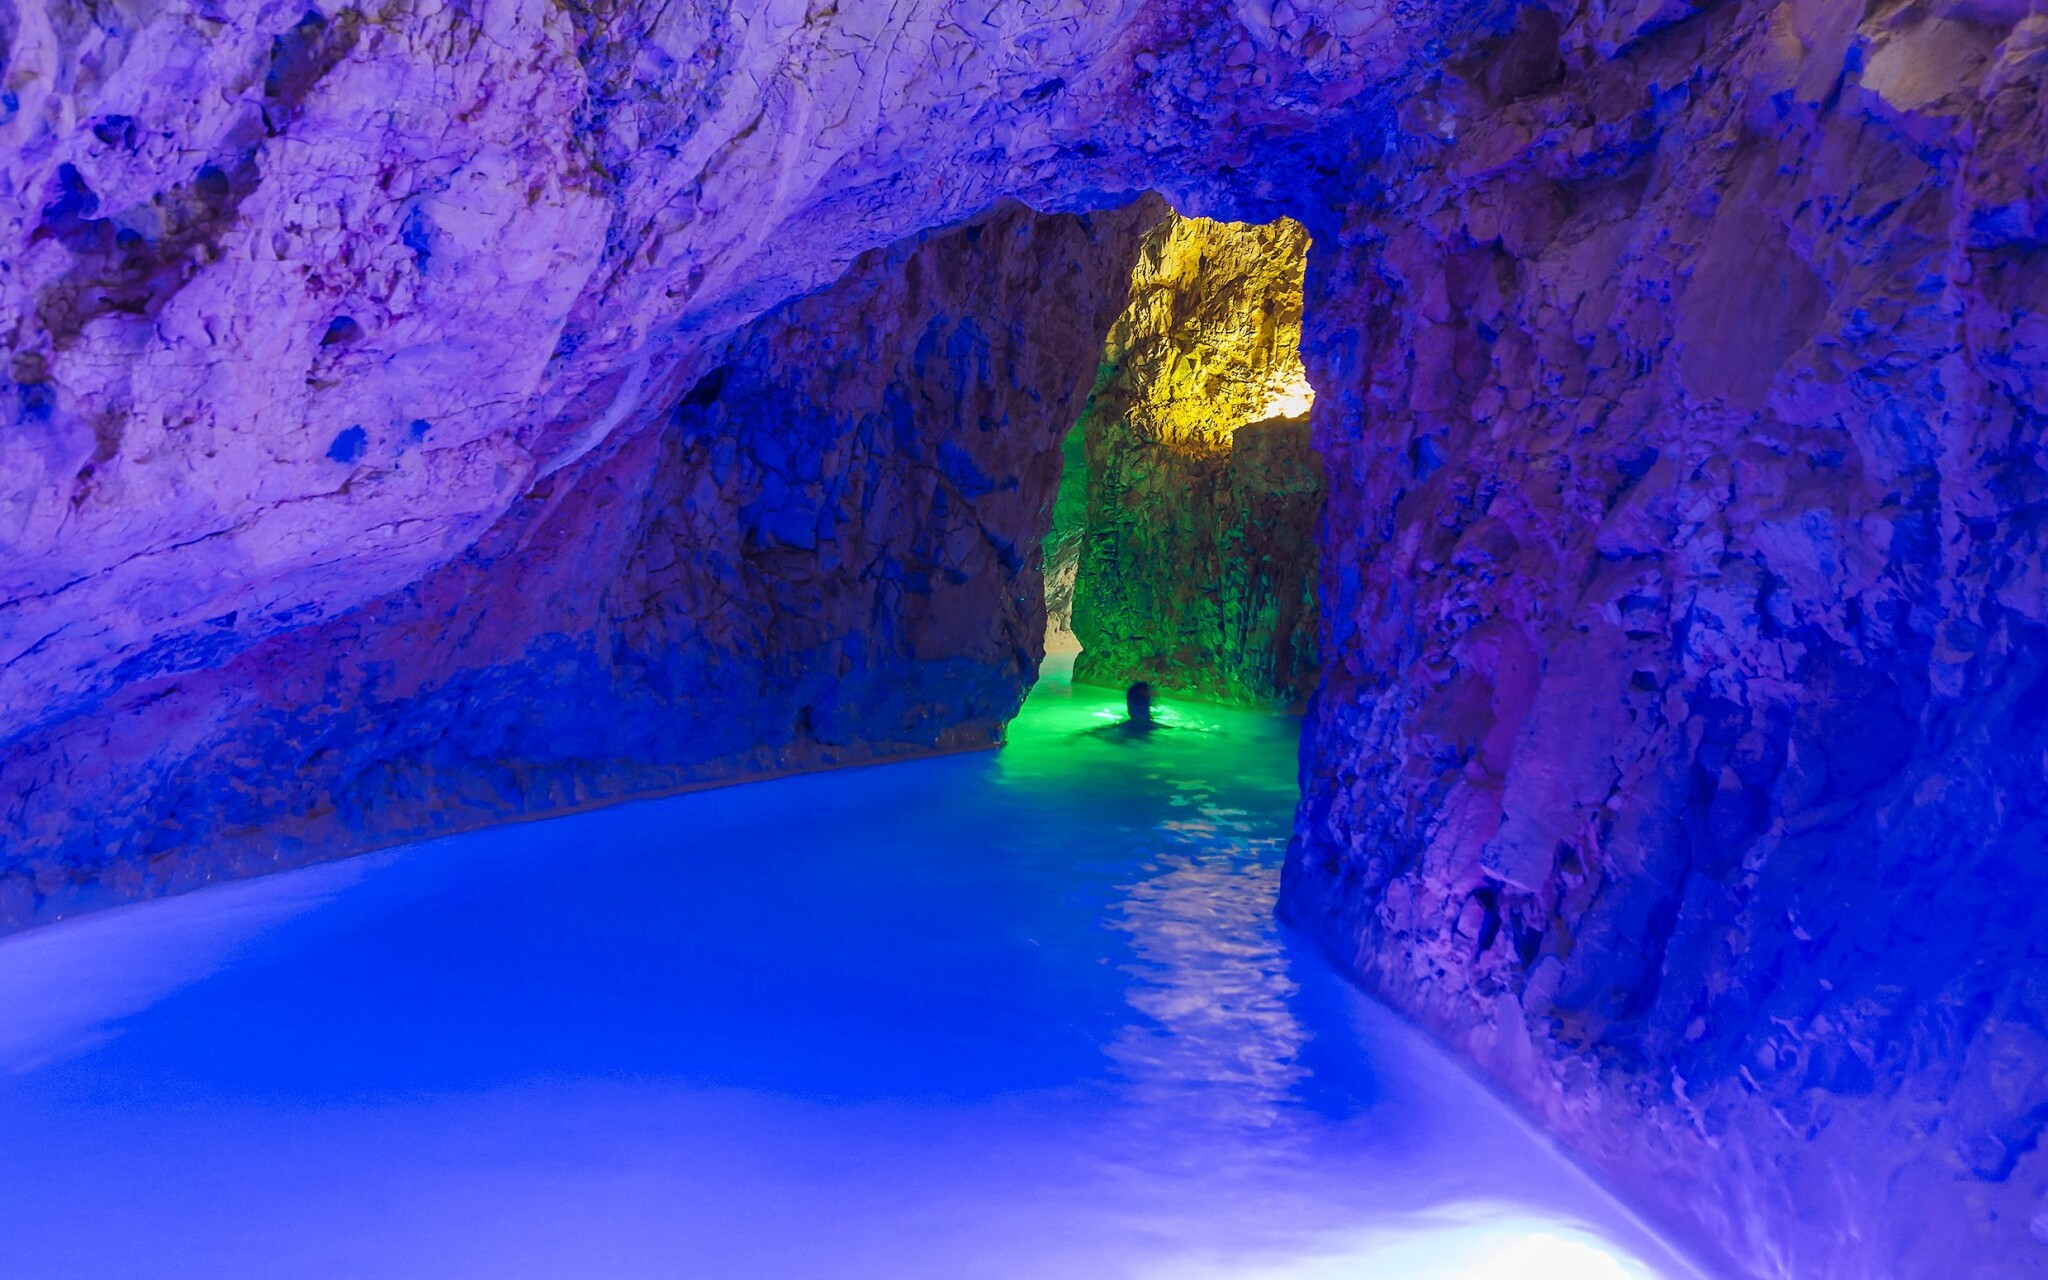 Jaskynné kúpele Miskolc Tapolca Maďarsko